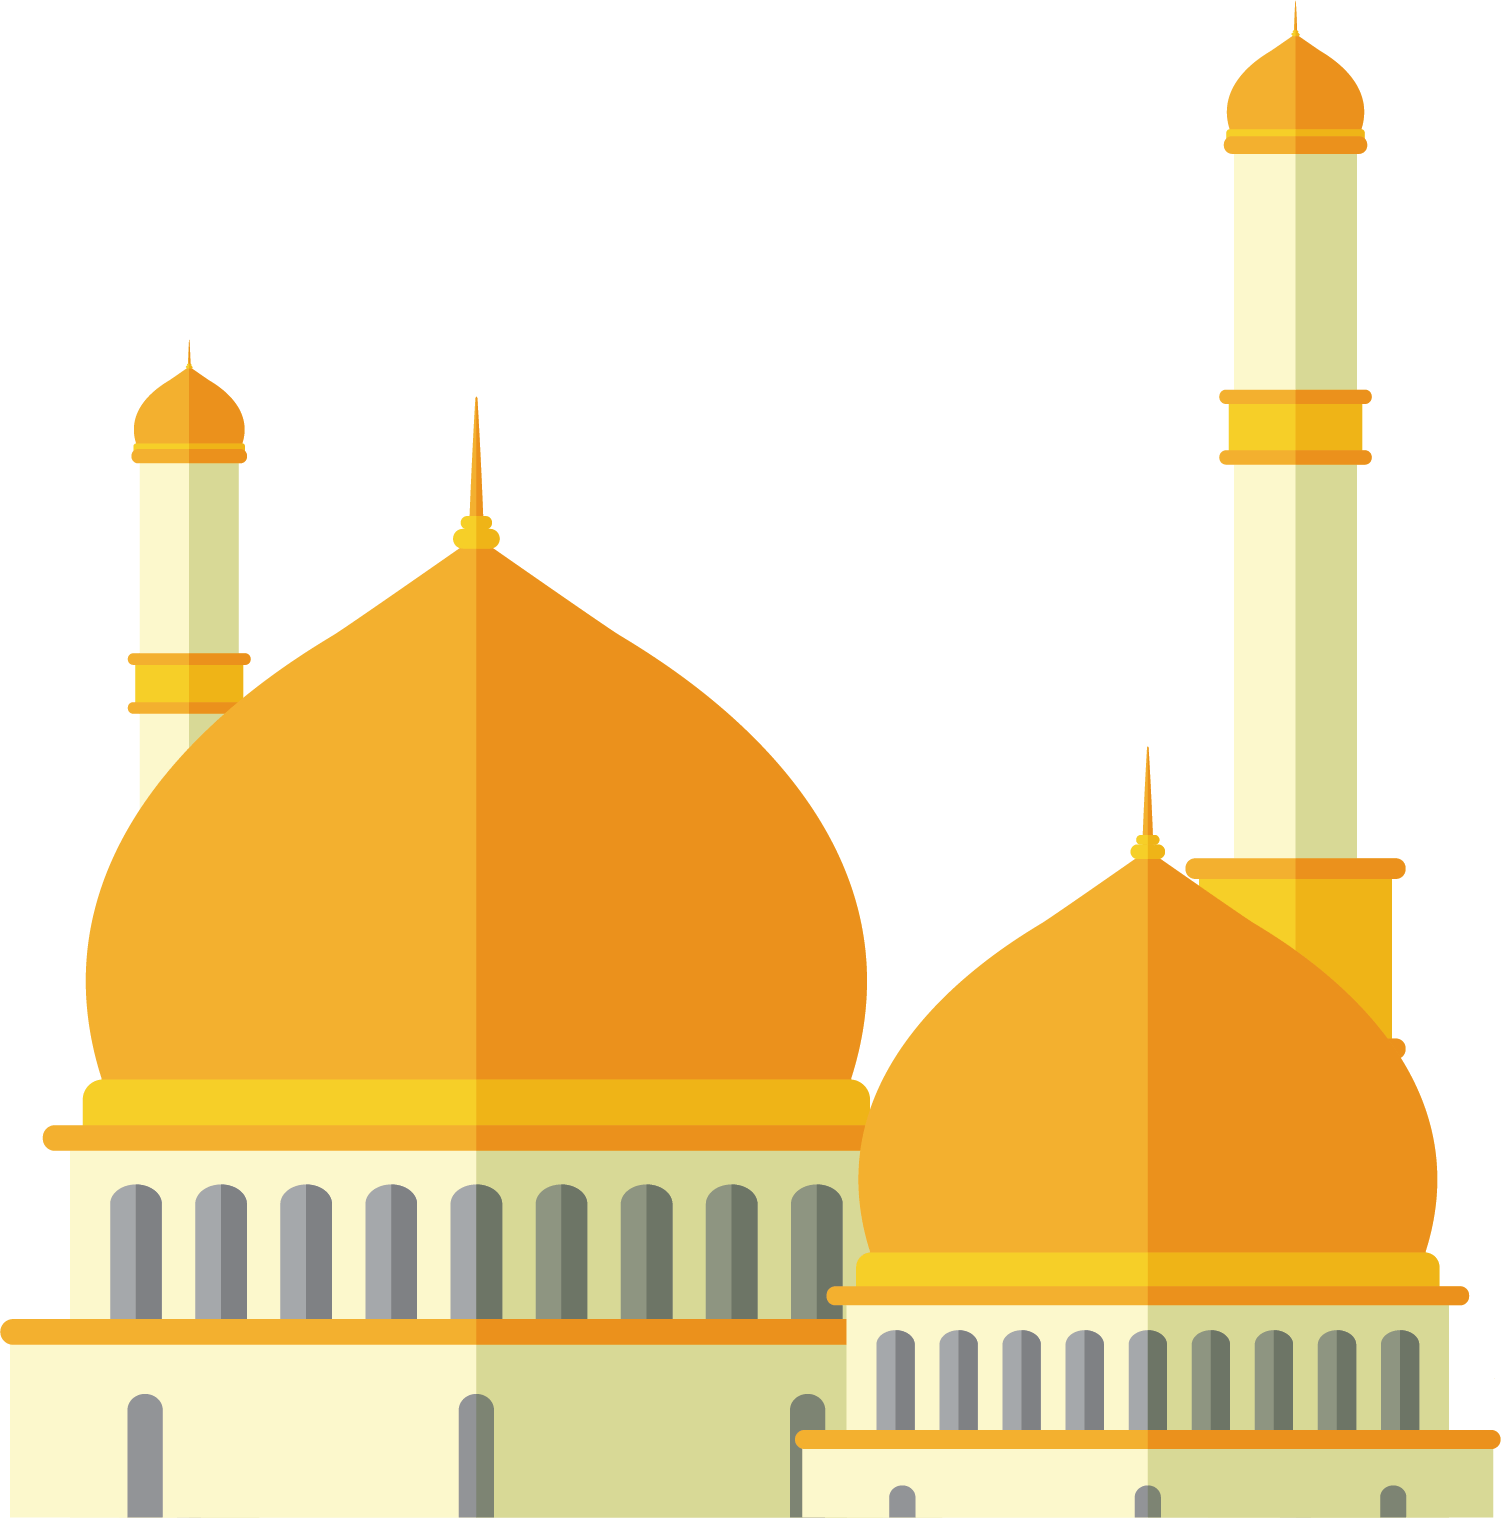 17 Gambar Masjid Mosque Kartun Vector Png Keren Desaintasik Com